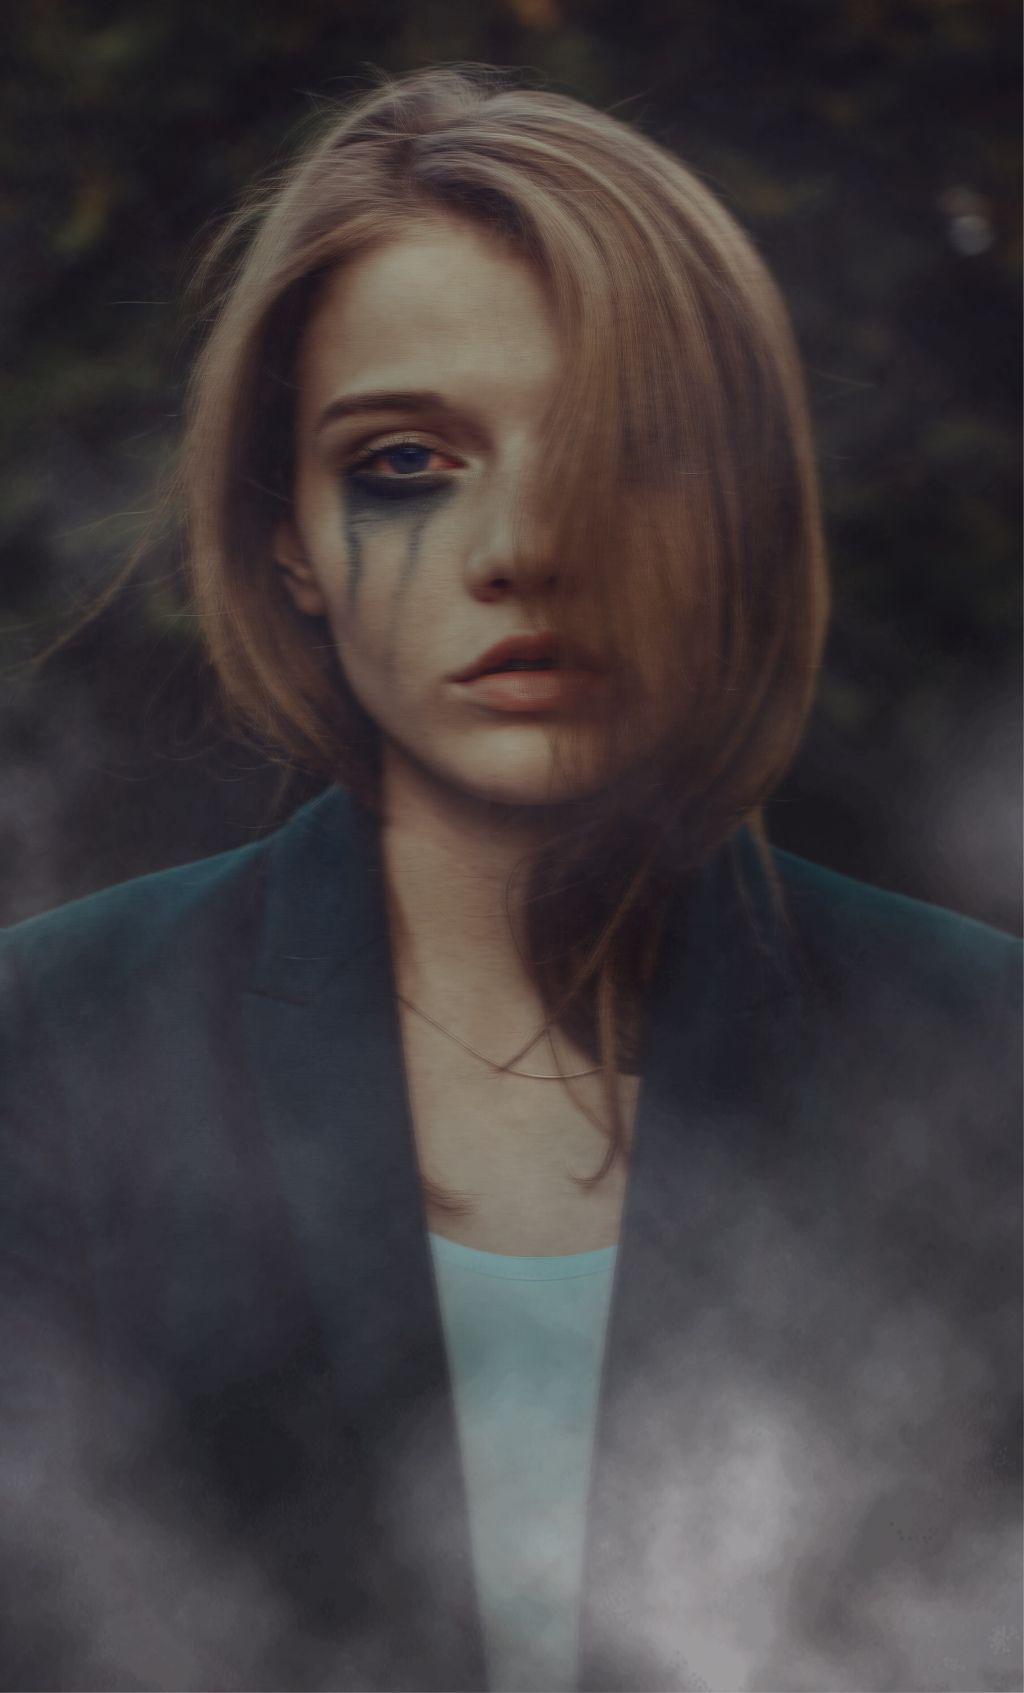 Freetoedit Sadness Interesting Art Sad Woman Blue Fog